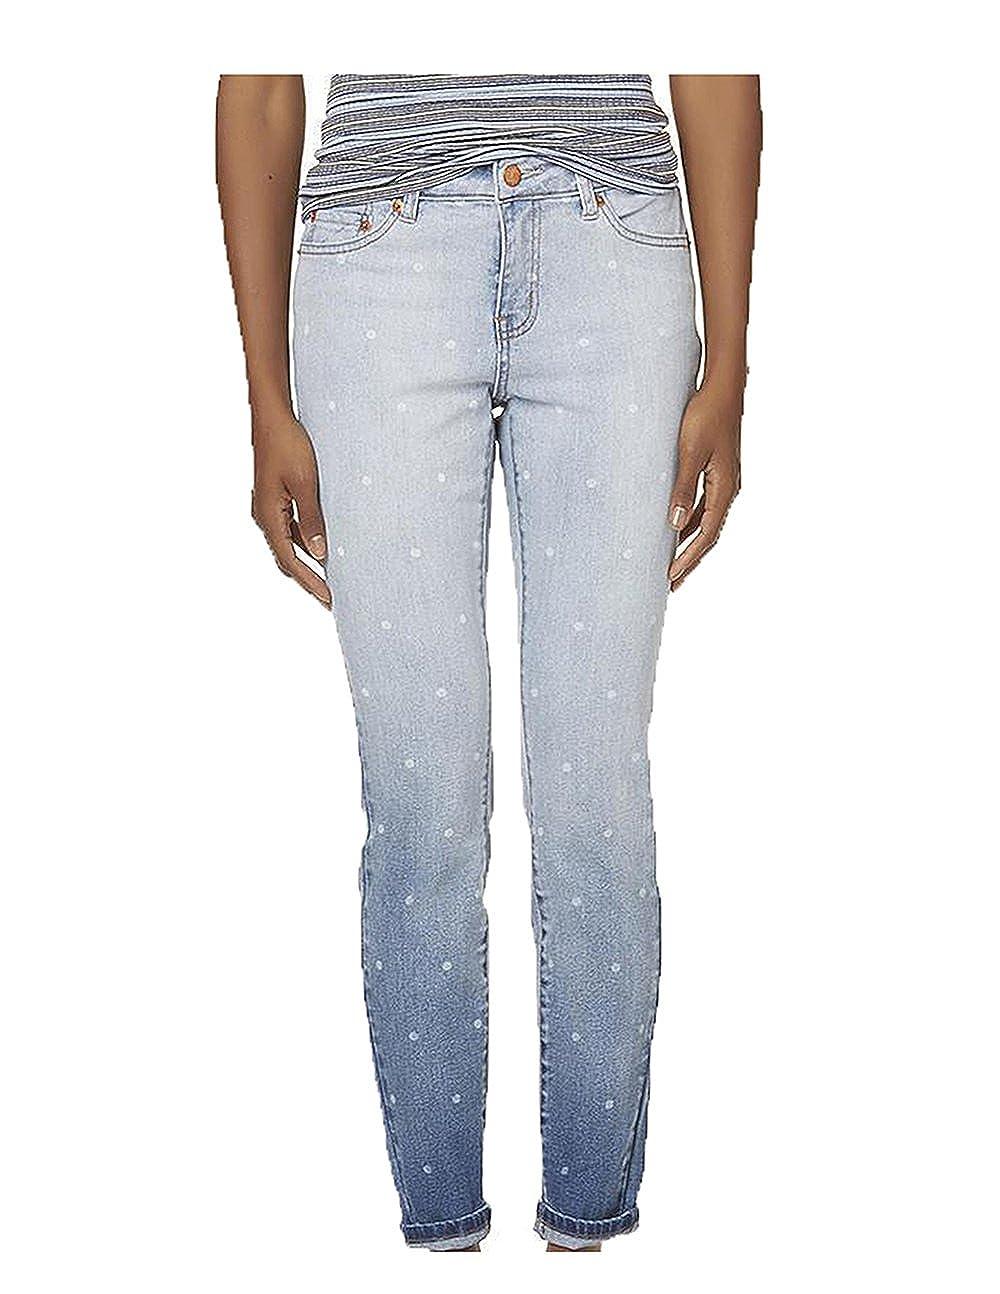 3444e0bc5 ROEBUCK   CO R1893 Womens Dot Print Skinny Blue Jeggings Jeans Sizes ...